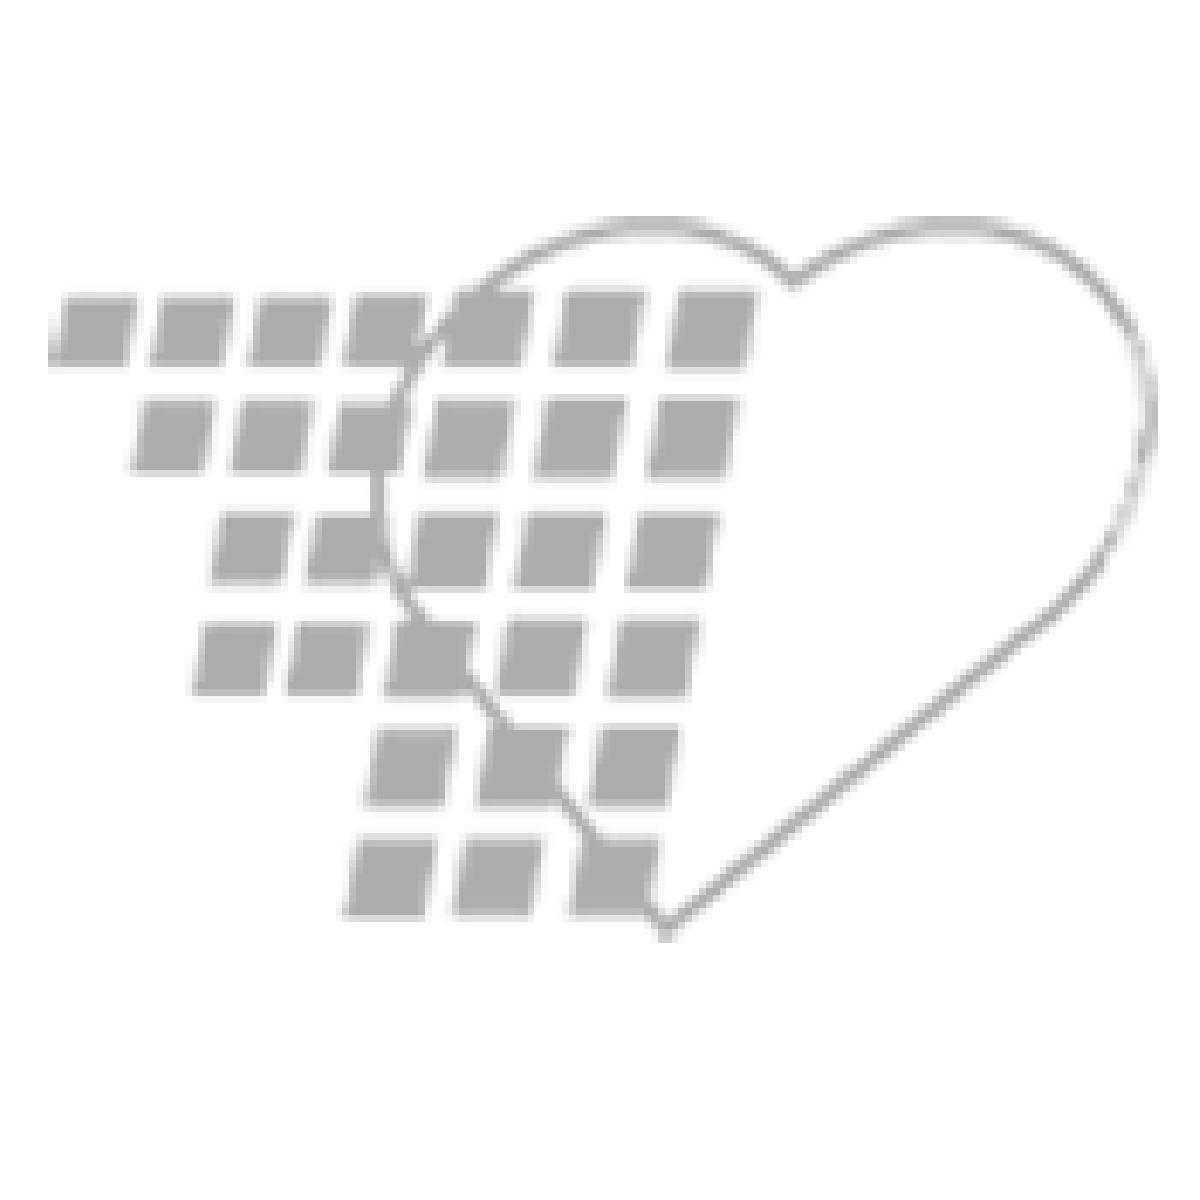 12-87-4283 - Pediatric Urine Collector - 200mL